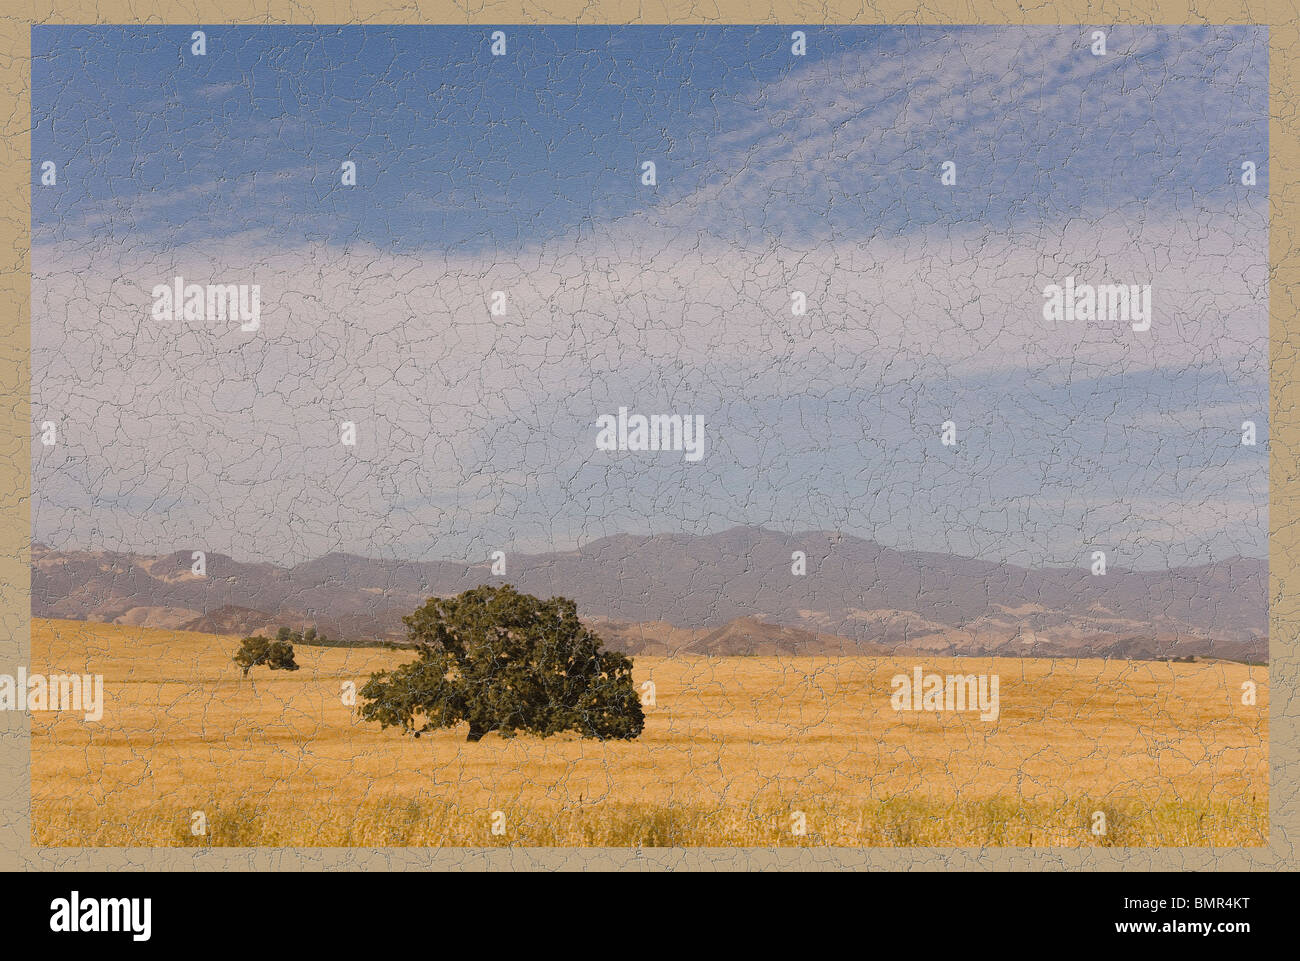 Árbol solitario Imagen De Stock